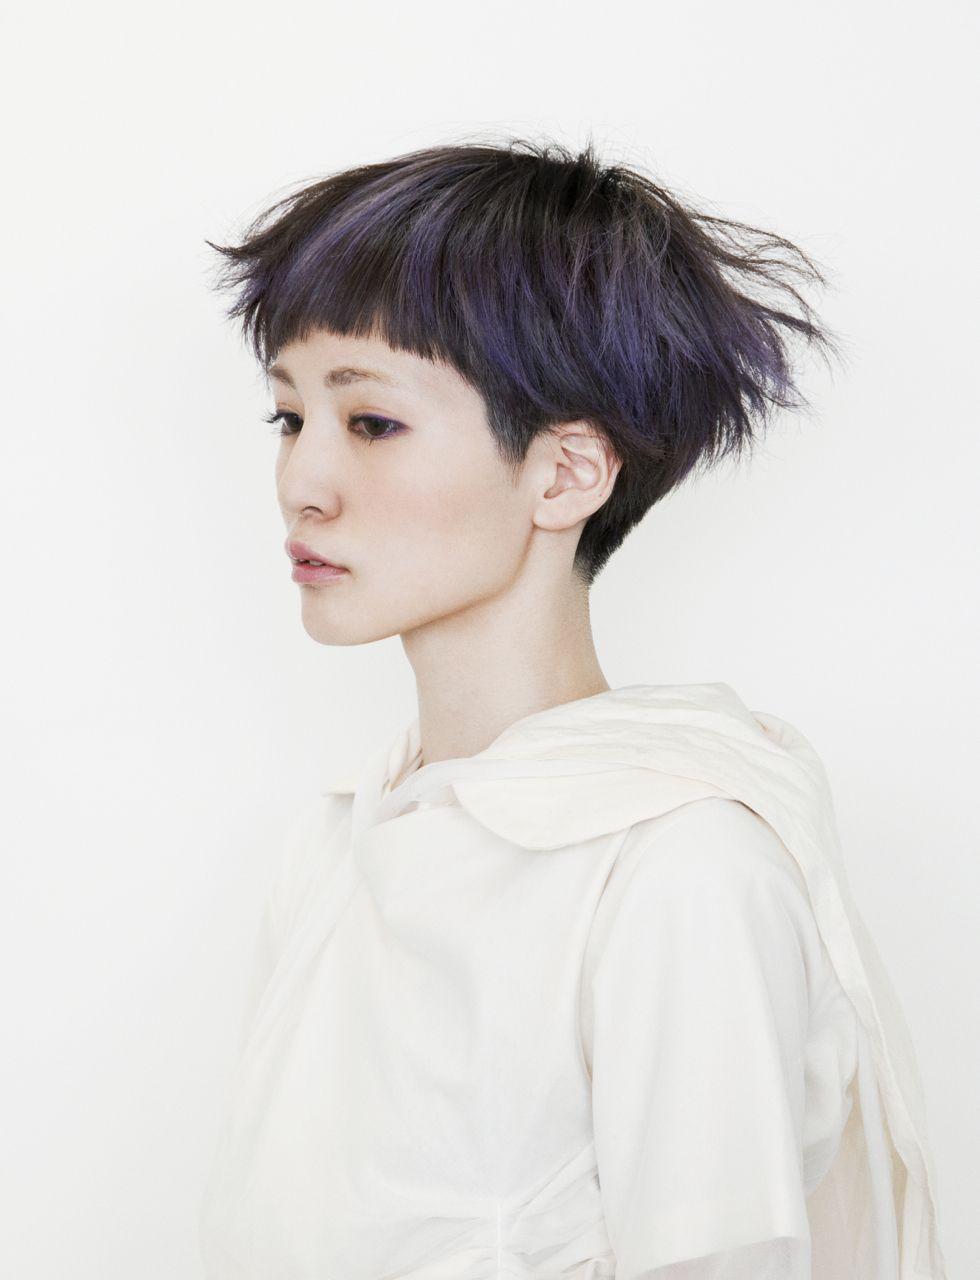 Bob舞台裏 soichirouchida blogs droptokyo hair pinterest